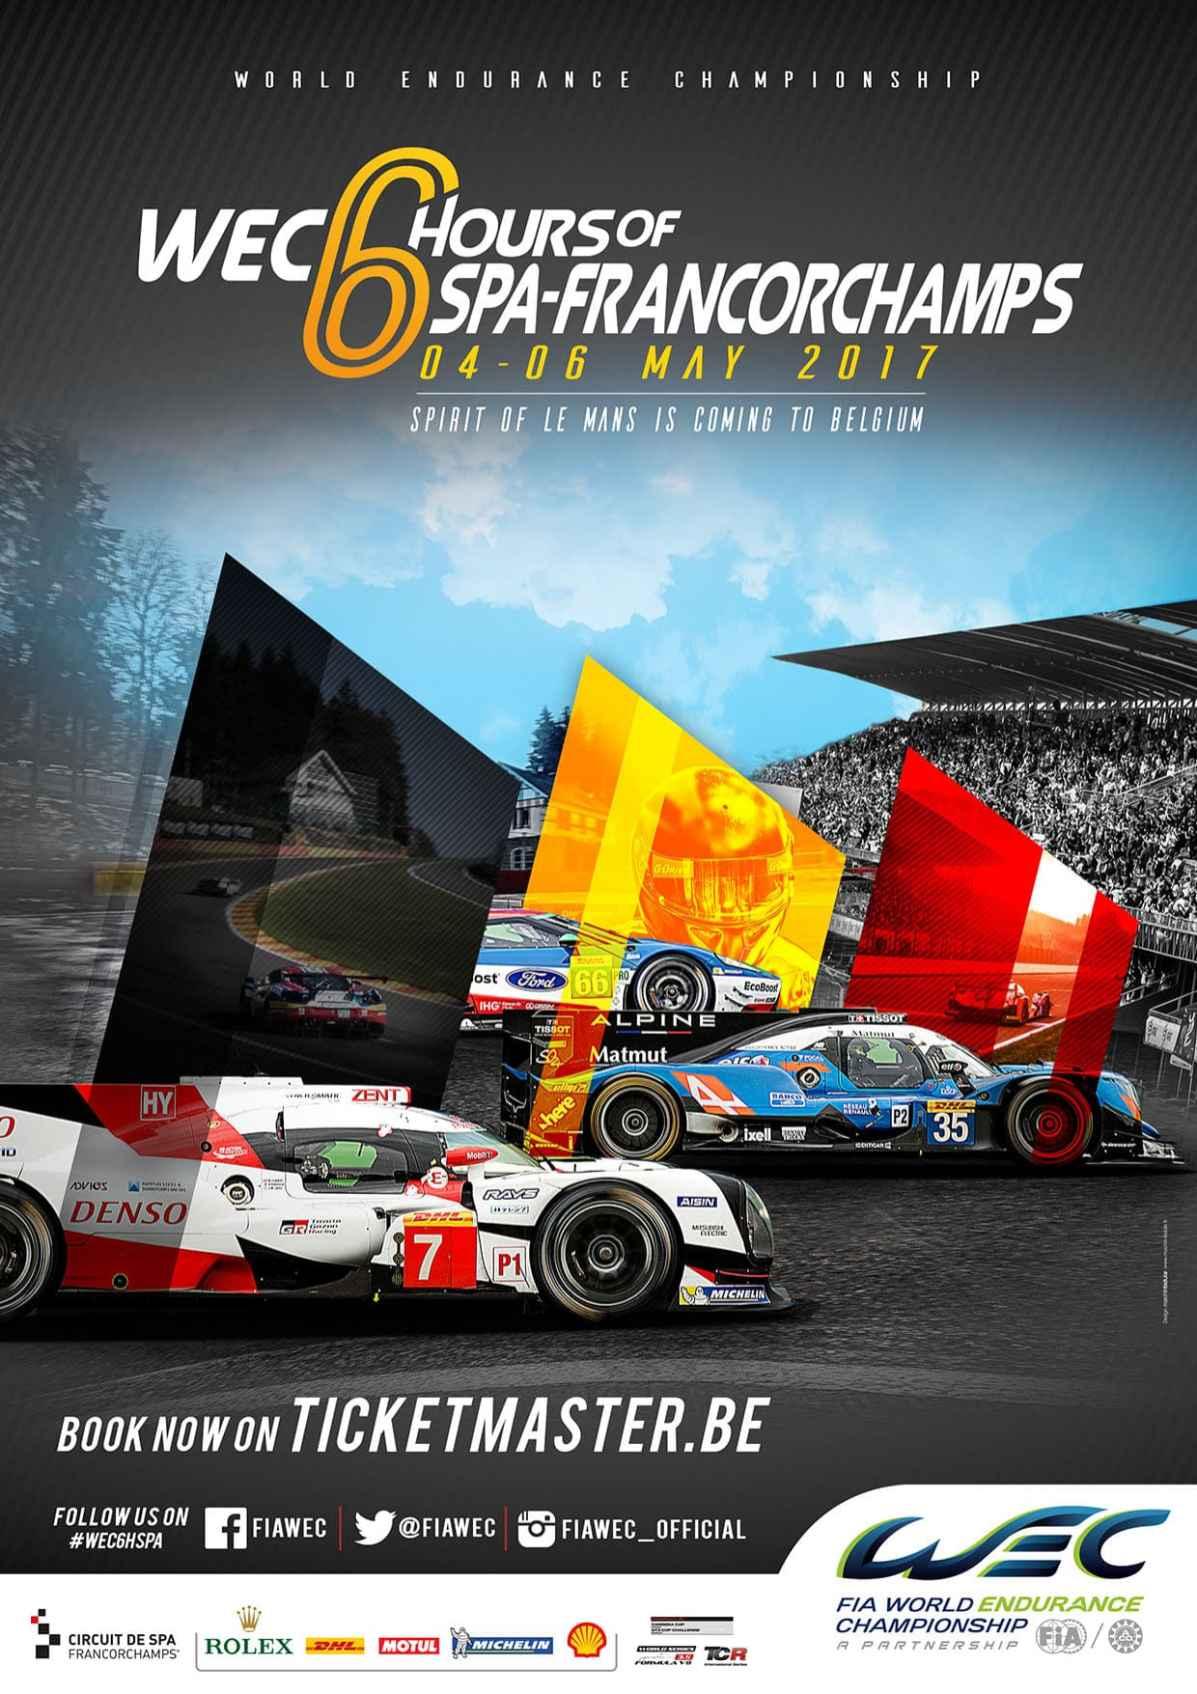 Affiche Spa Francorchamps Alpine Signatech WEC 2017 - 4